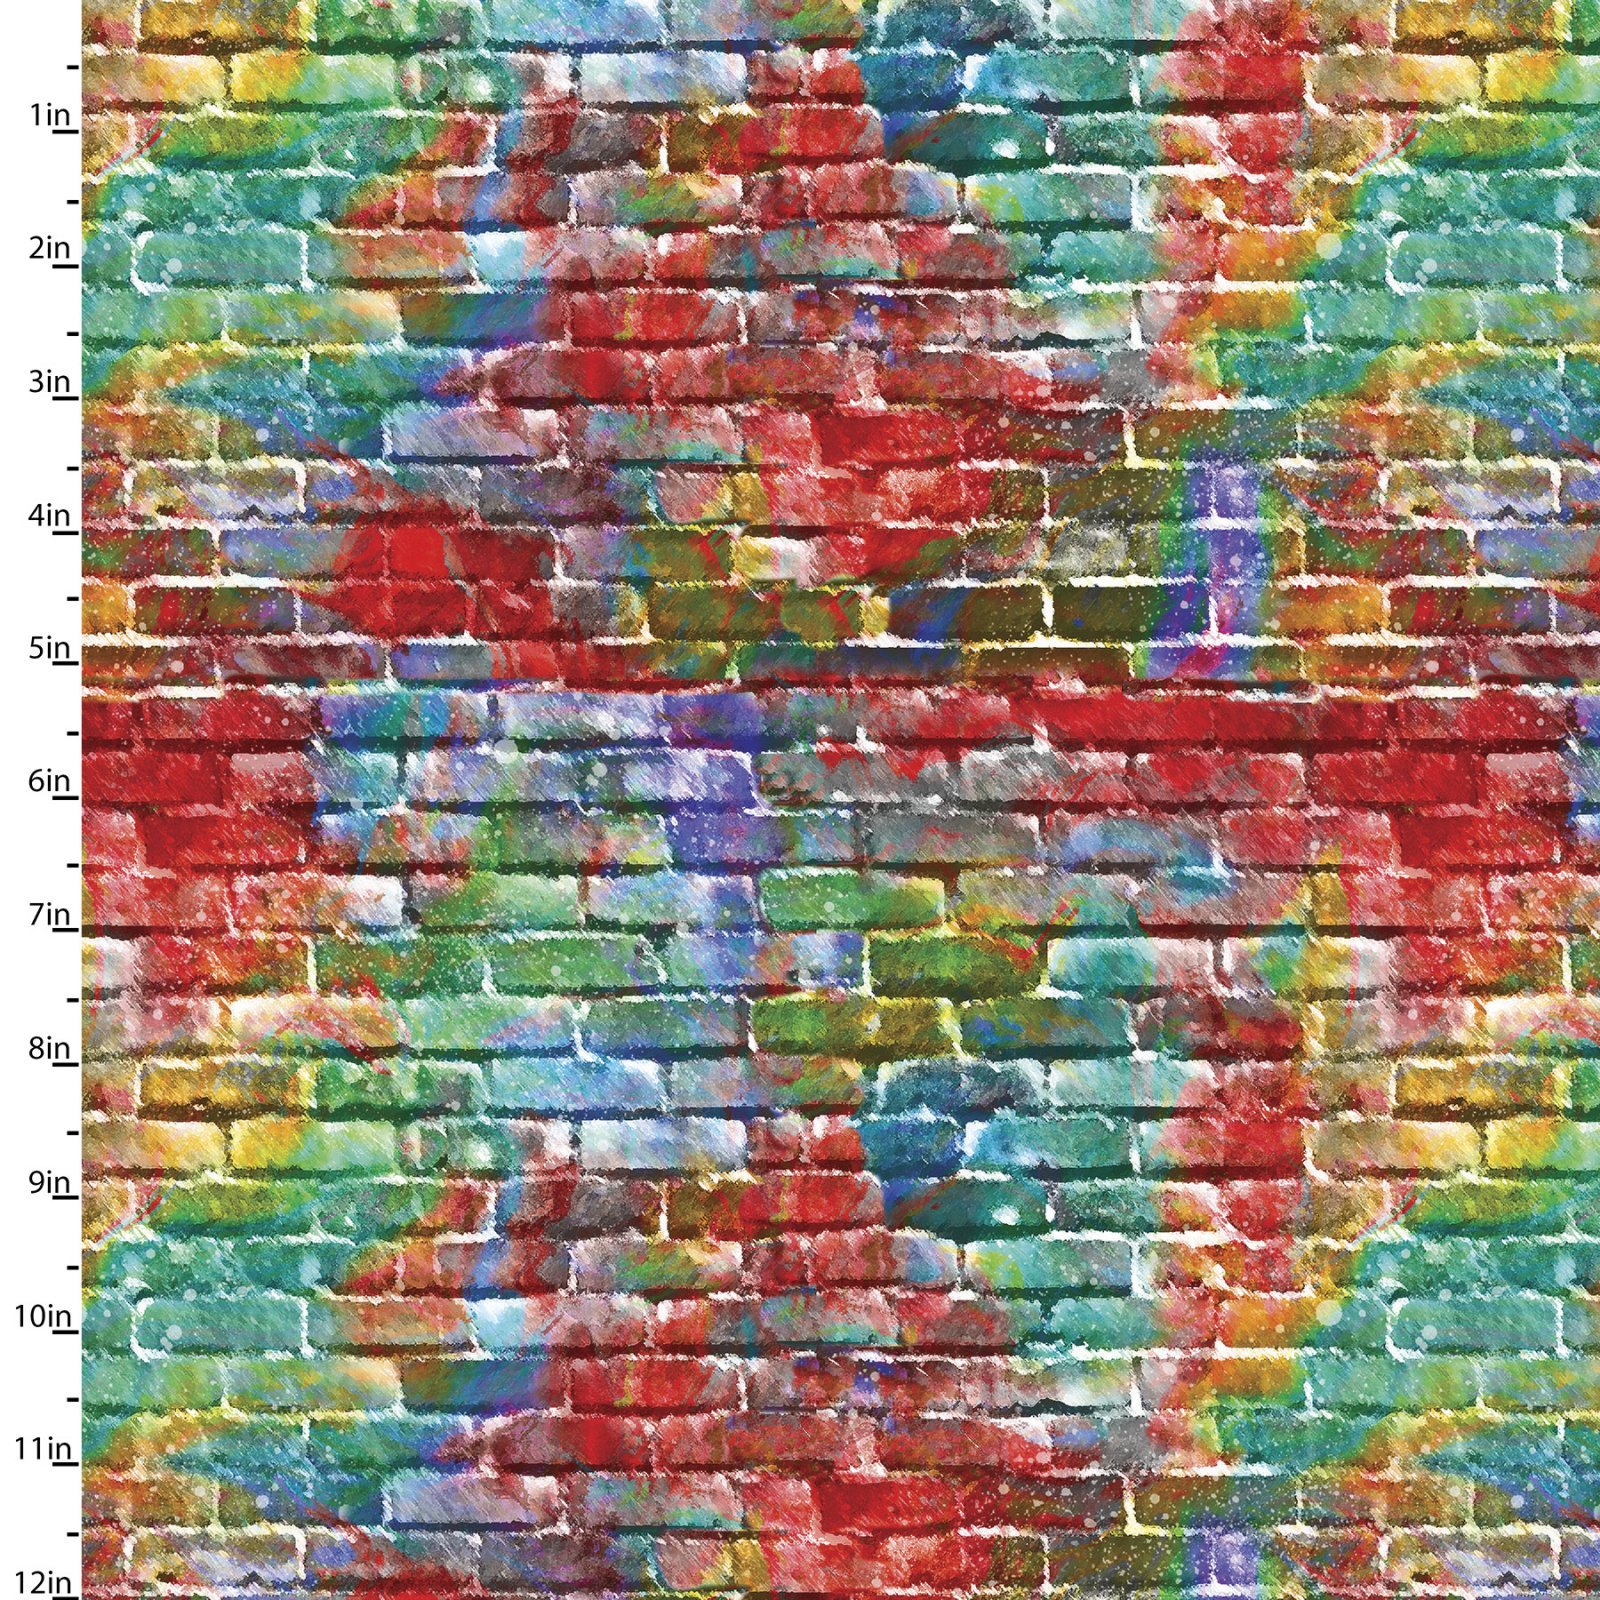 Sip & Snip Wine 14907 Brick Wall